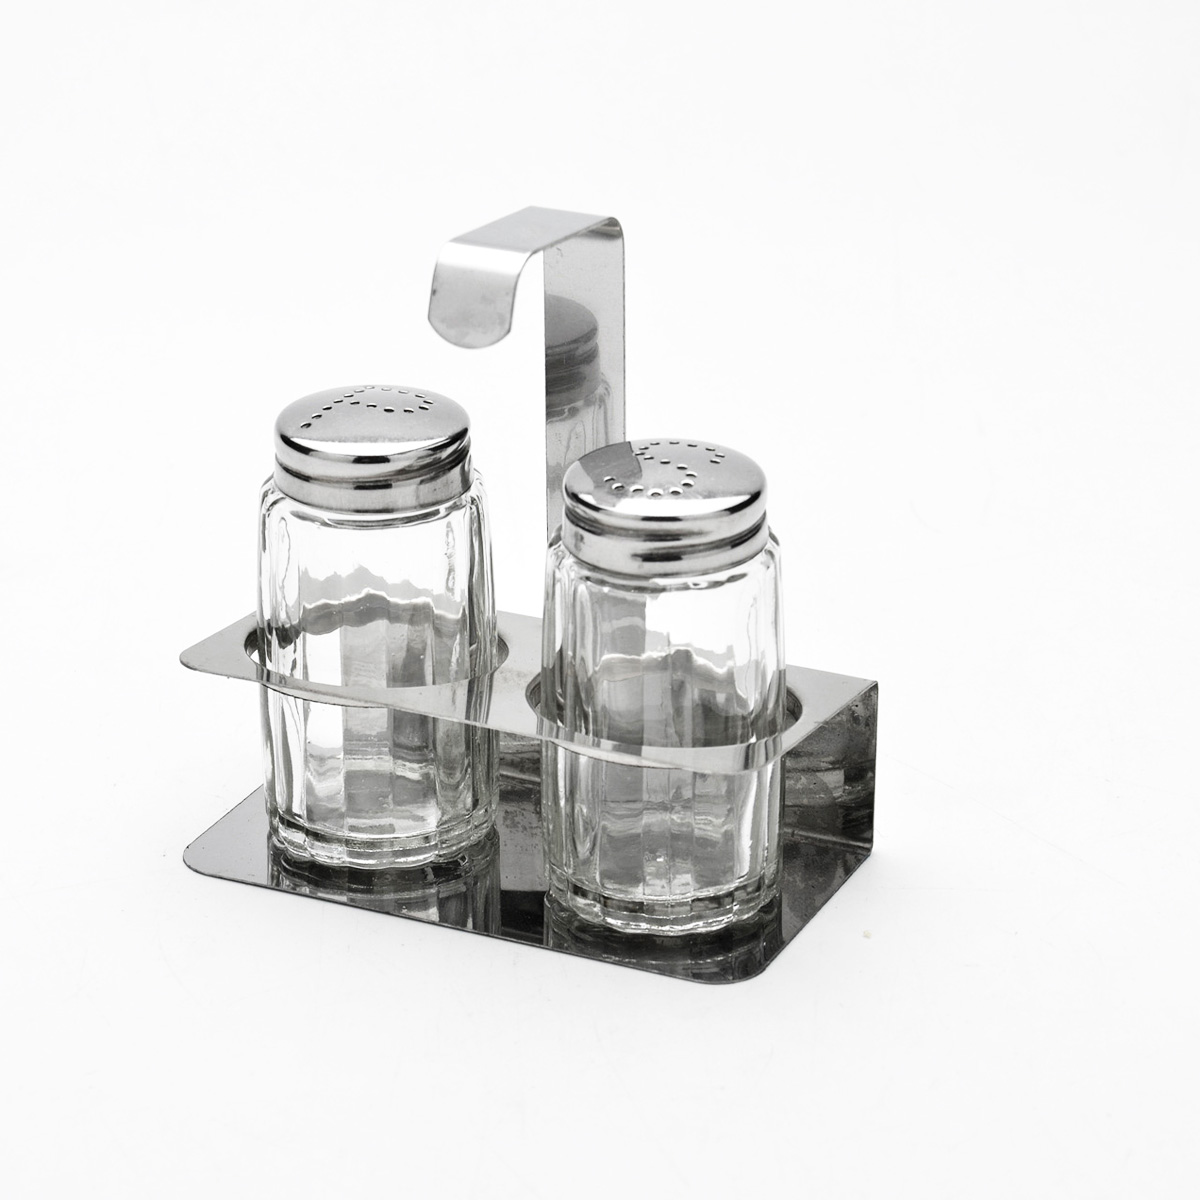 Набор для специй Mayer & Boch, 3 предмета. 9202 ваза 29 5 см х 21 см х 34 см